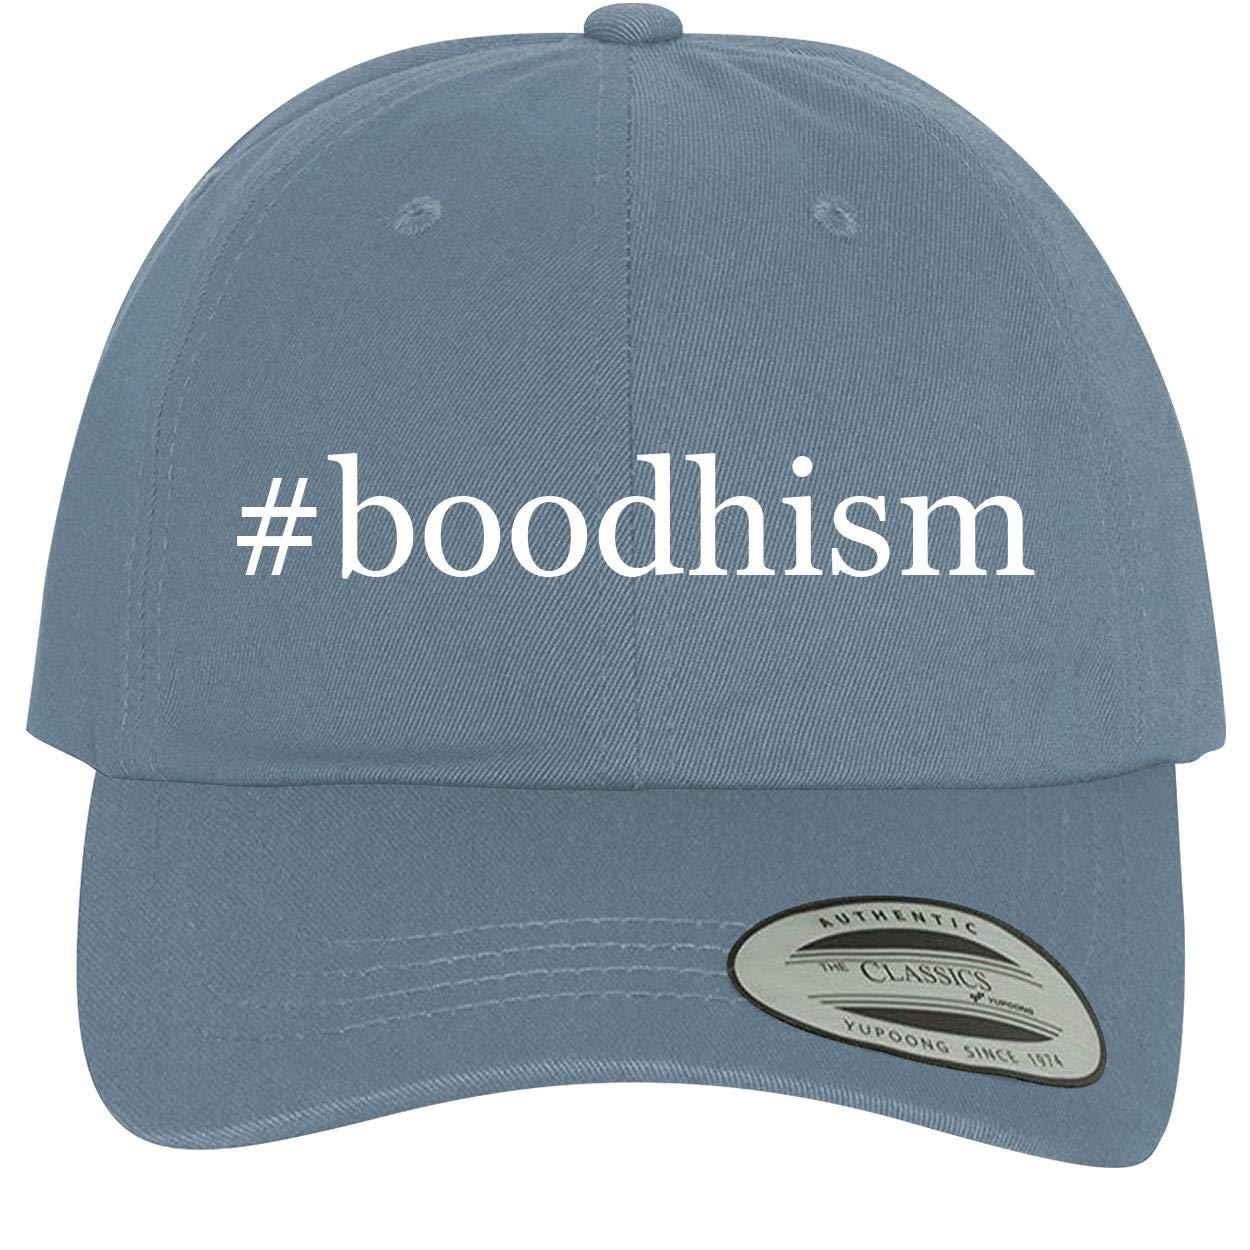 BH Cool Designs #Boodhism Comfortable Dad Hat Baseball Cap